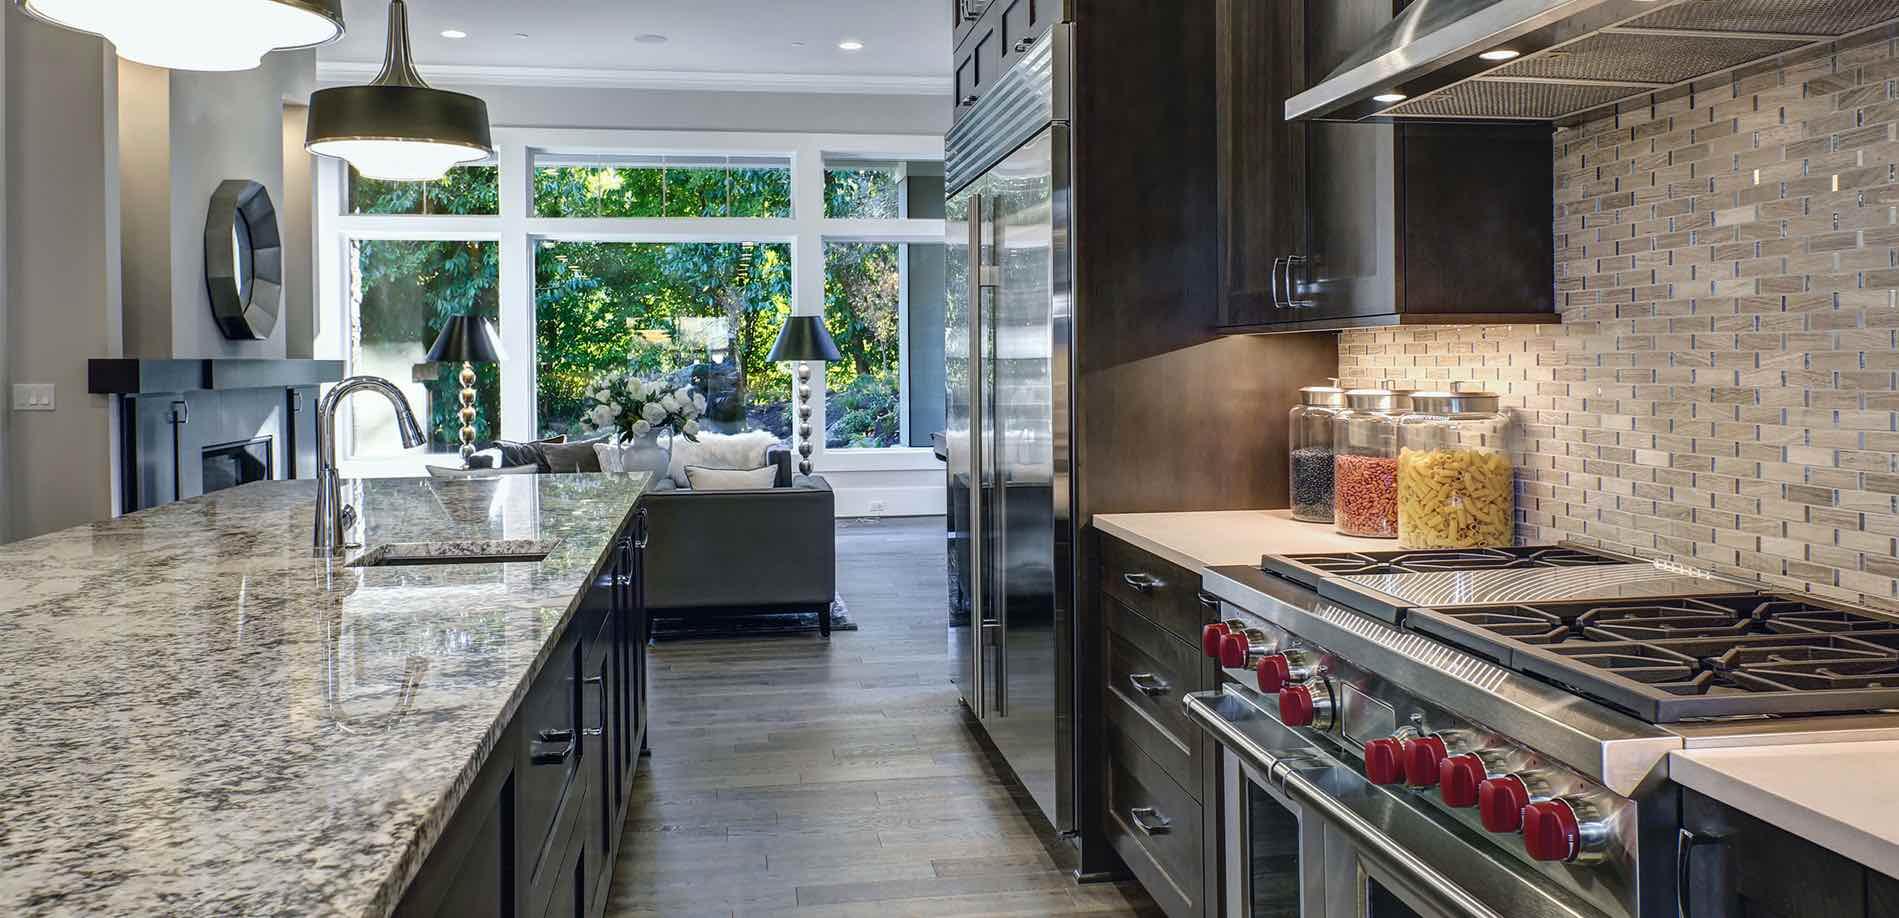 granite countertops, tile & stone flooring, kitchen & bath